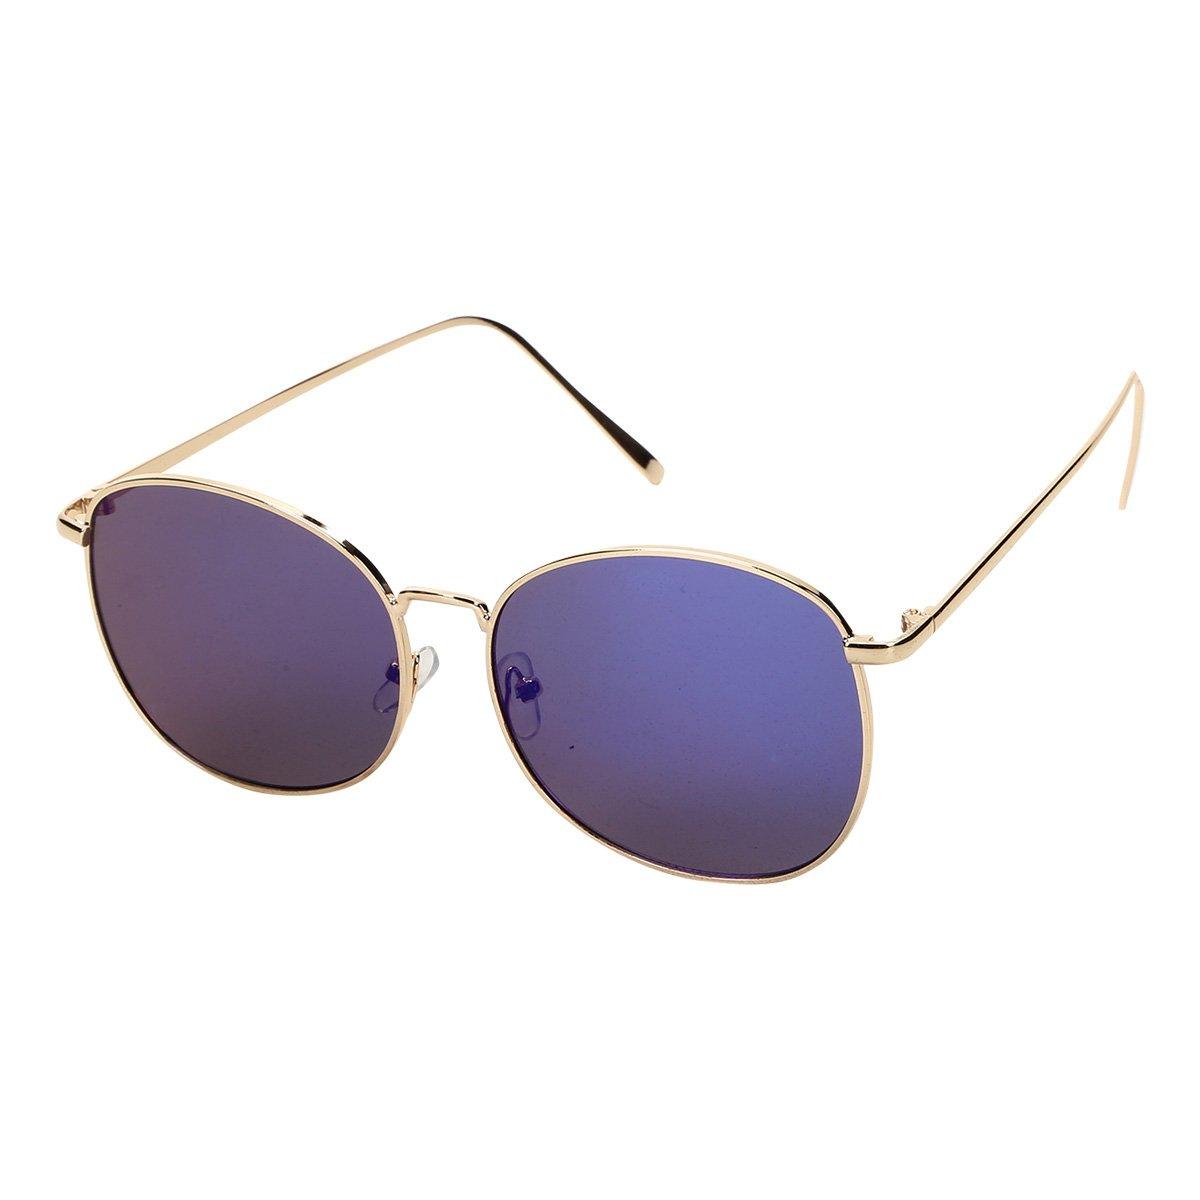 97662d9b075d0 Óculos King One TG534 Feminino - Compre Agora